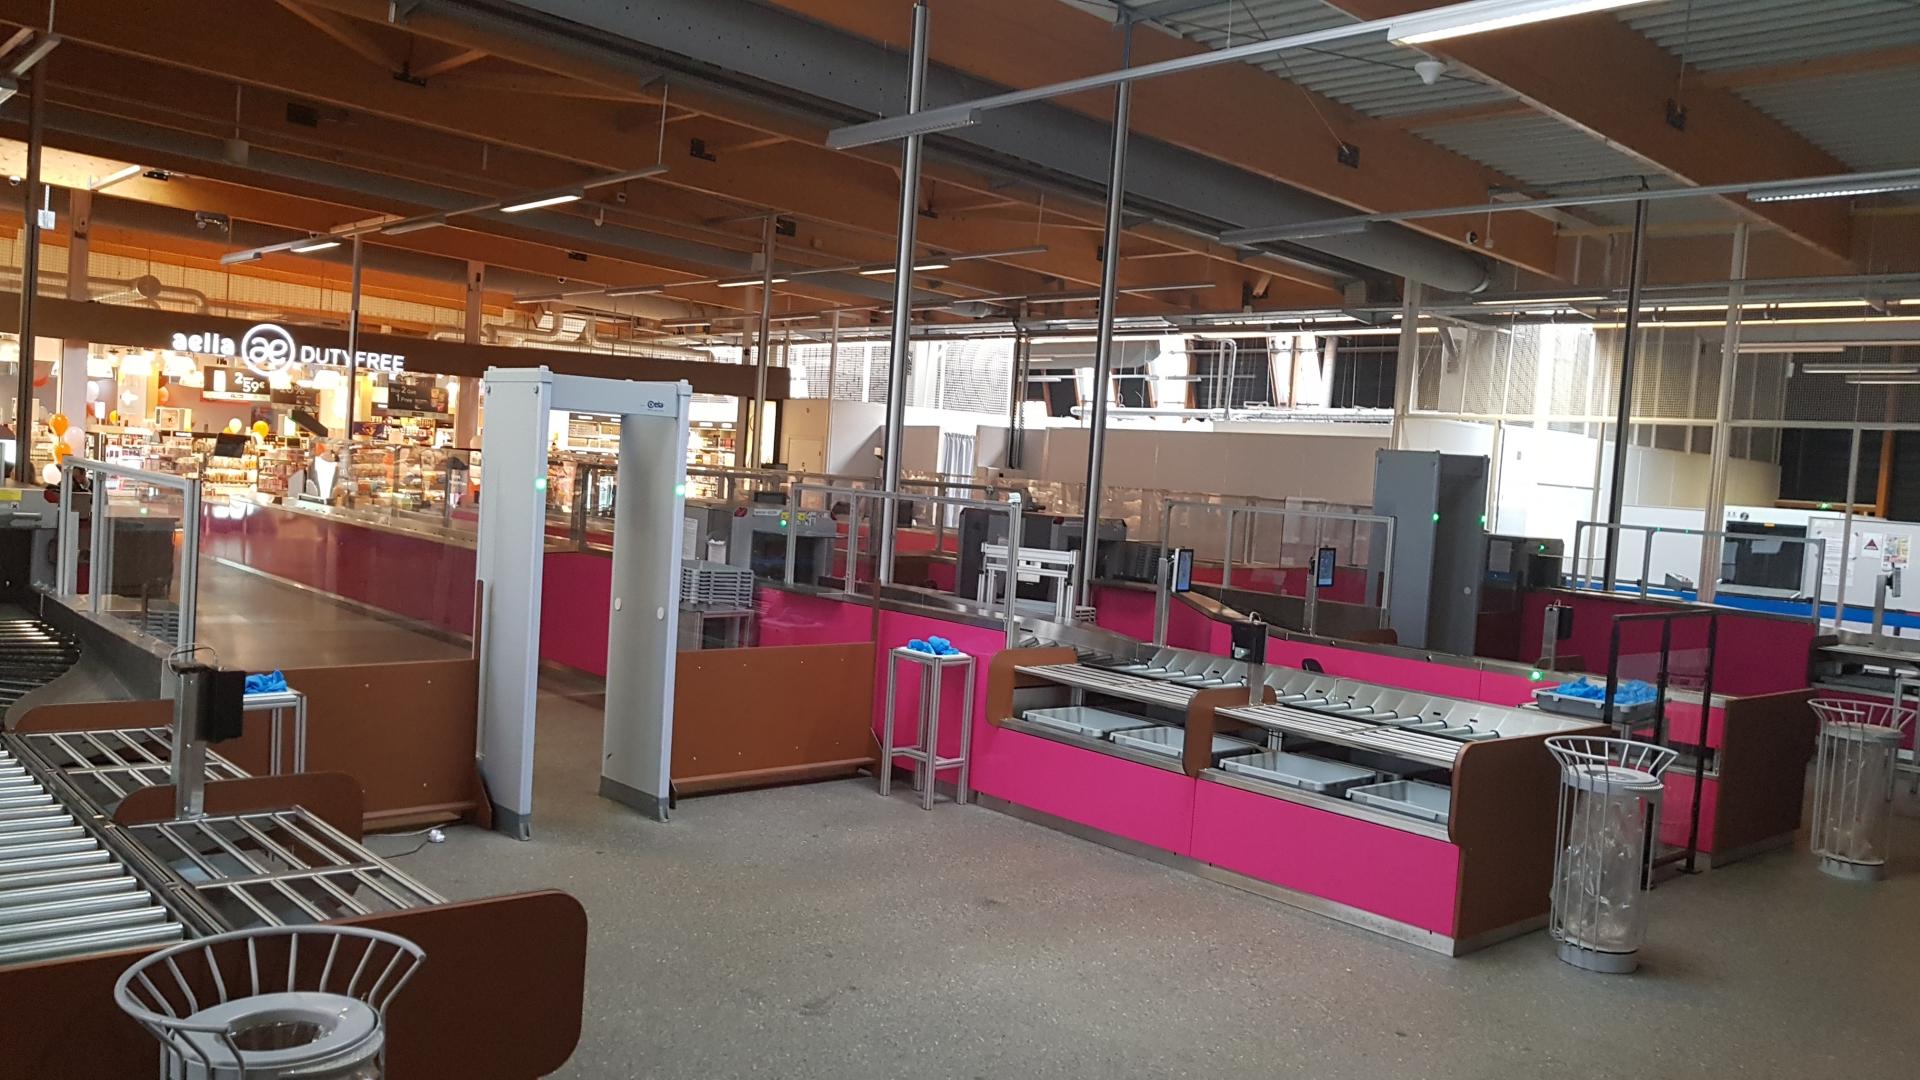 ALFYMA Airport | Aéroport de Bordeaux Mérignac